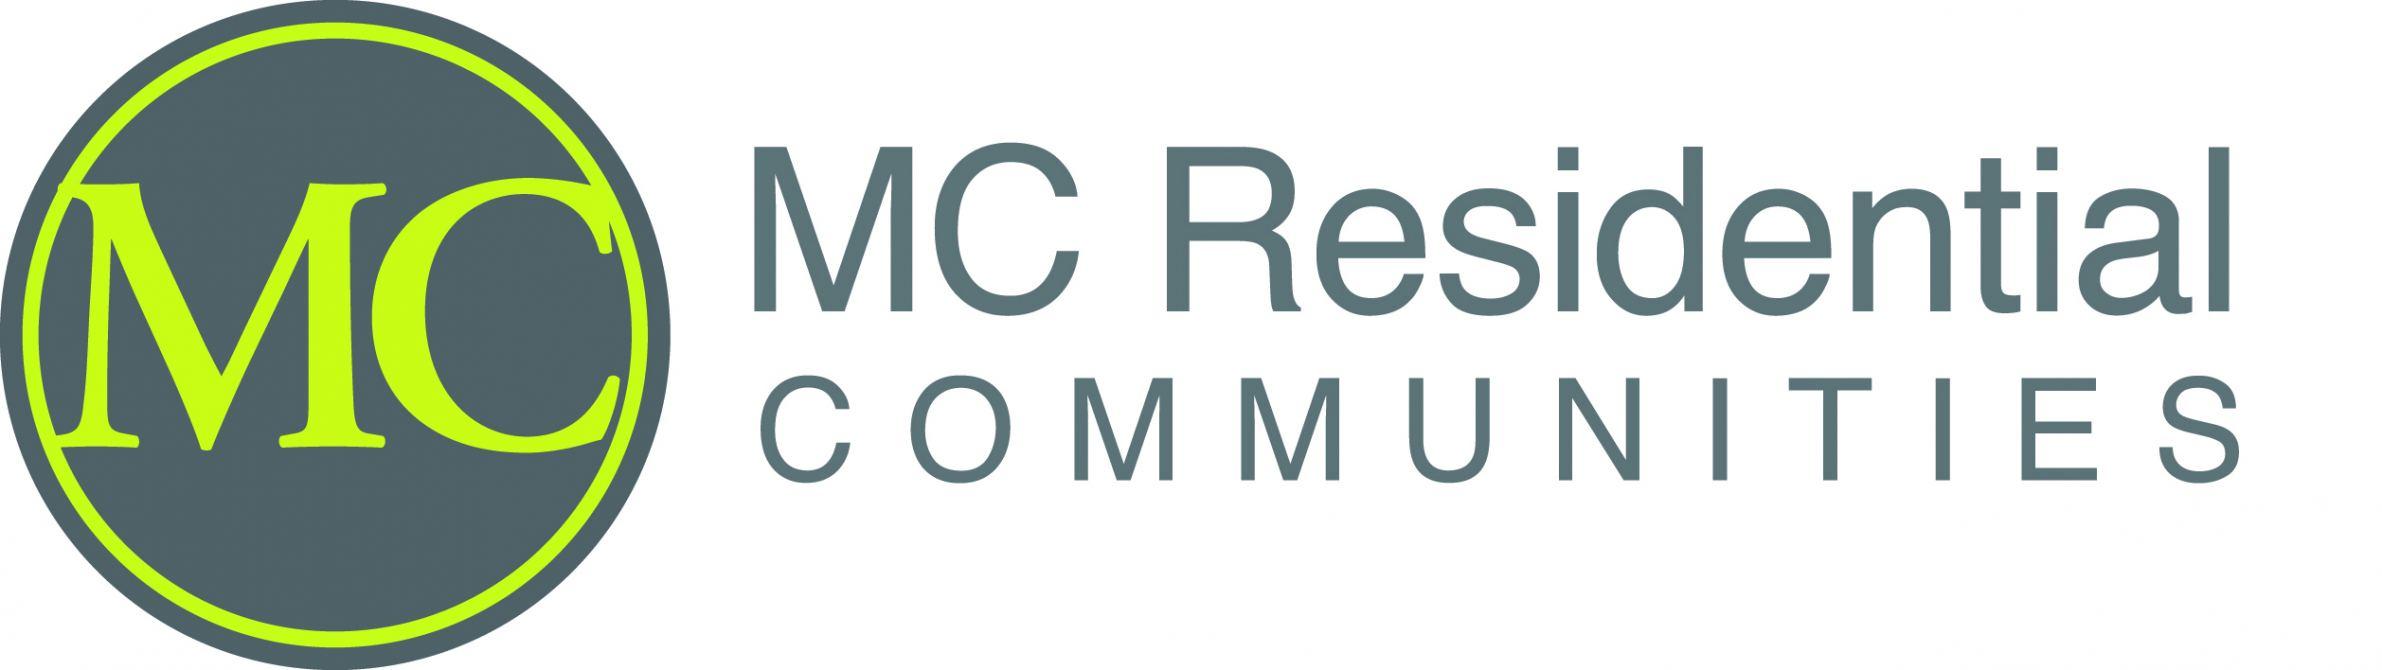 MC Residential Communities Logo